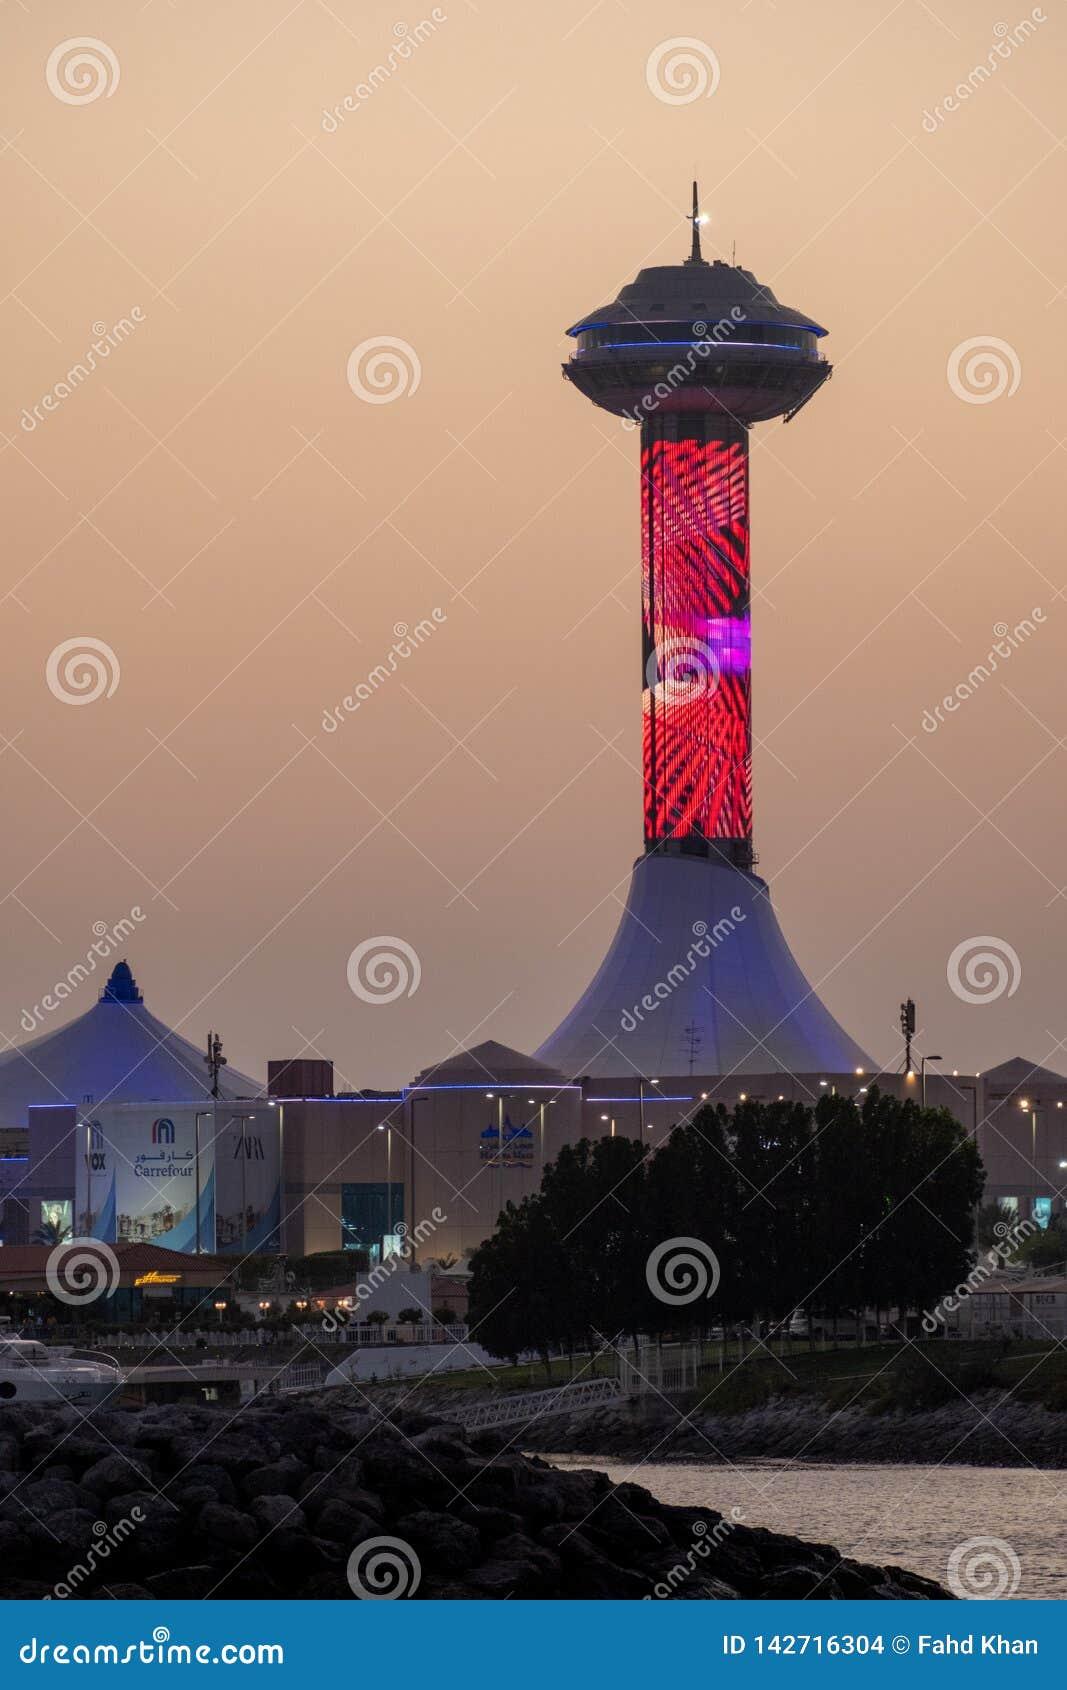 Evening view of Marina Mall Tower and Marina Mall